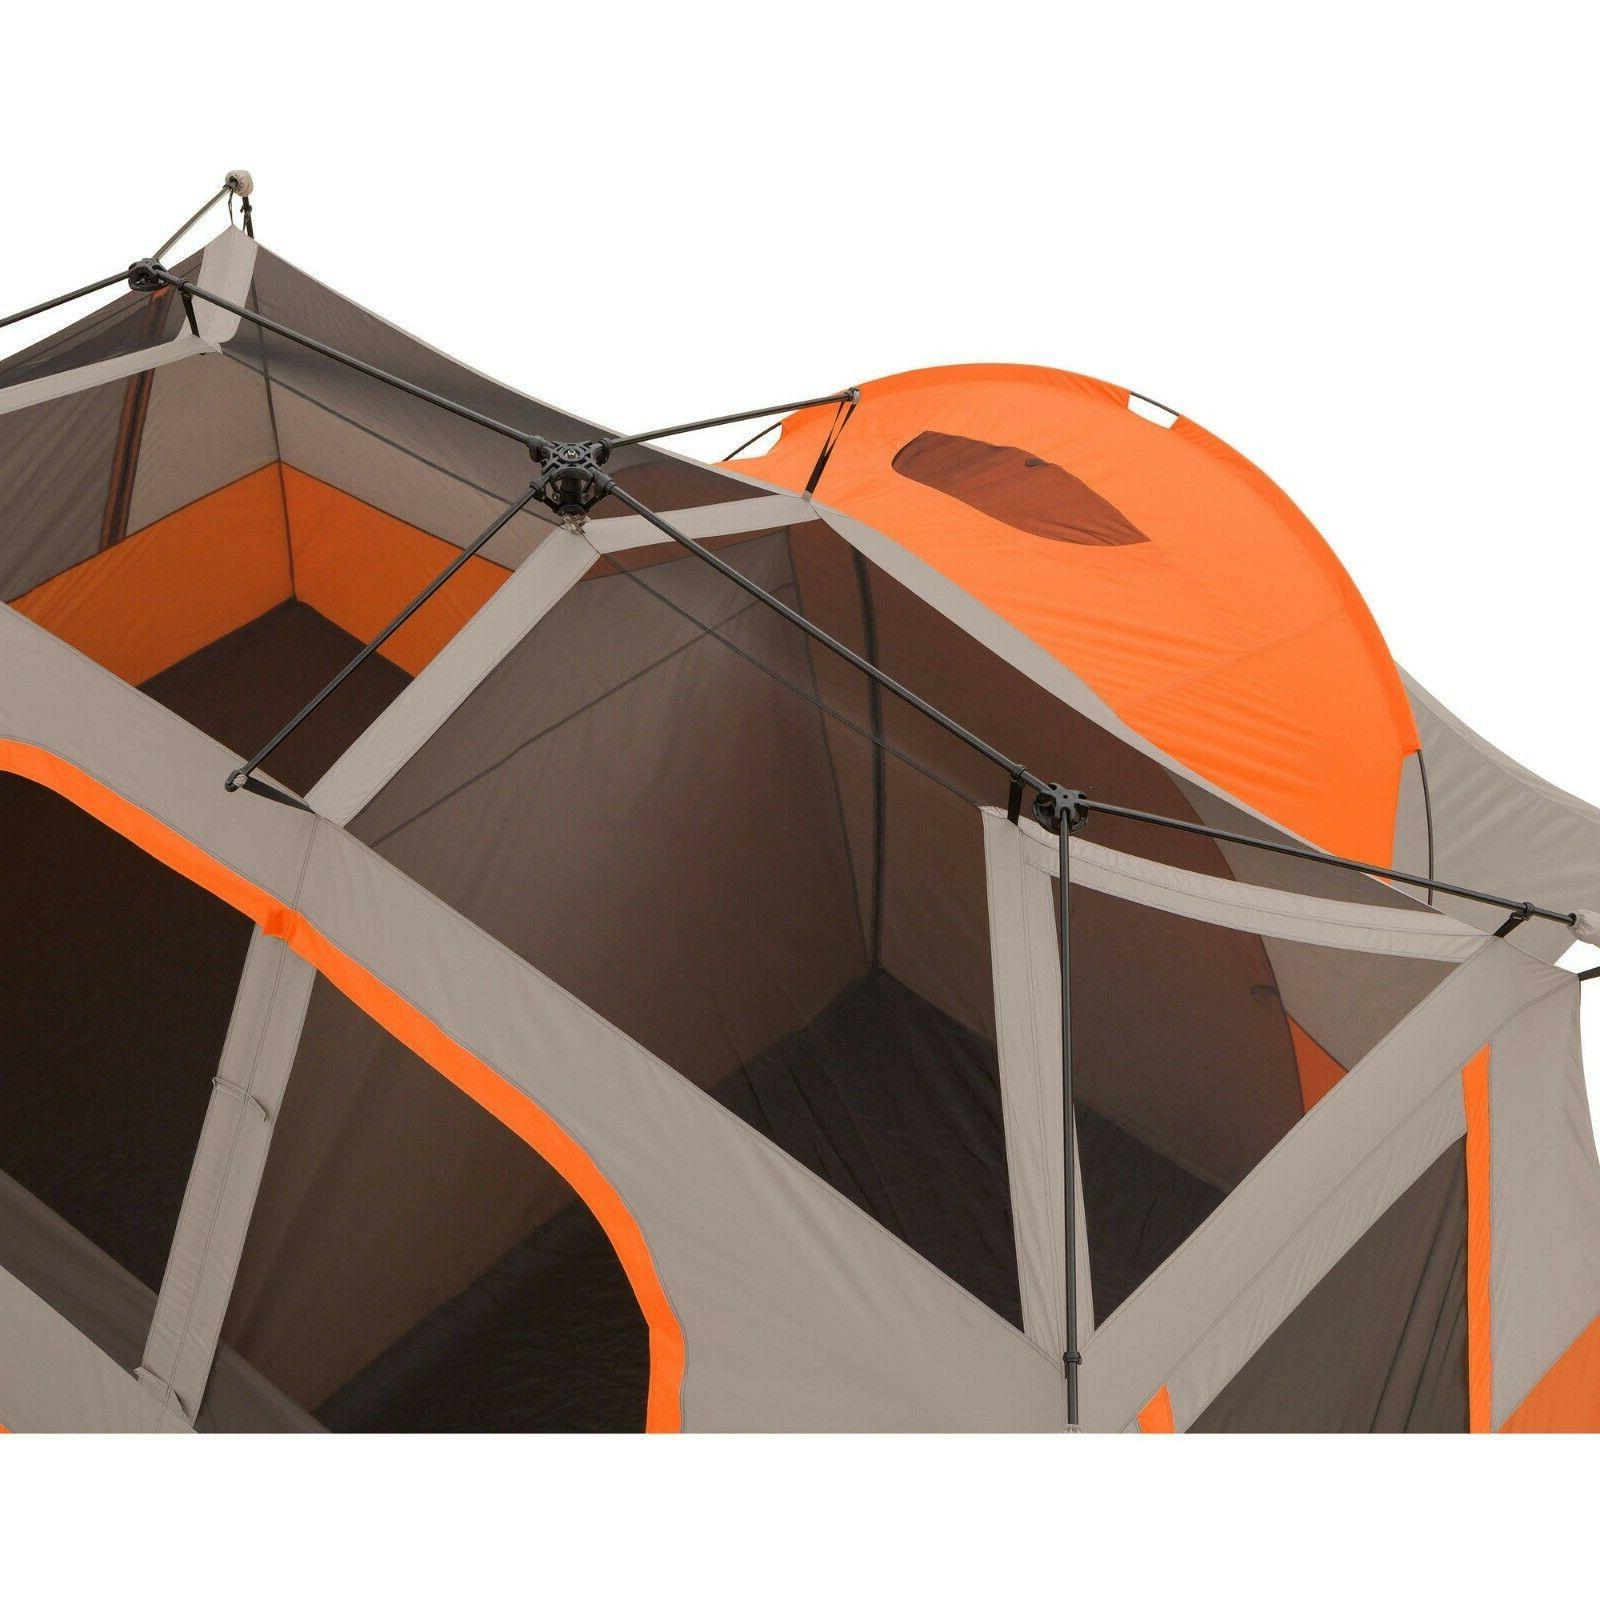 Large 11 Tent 3 Season Hiking